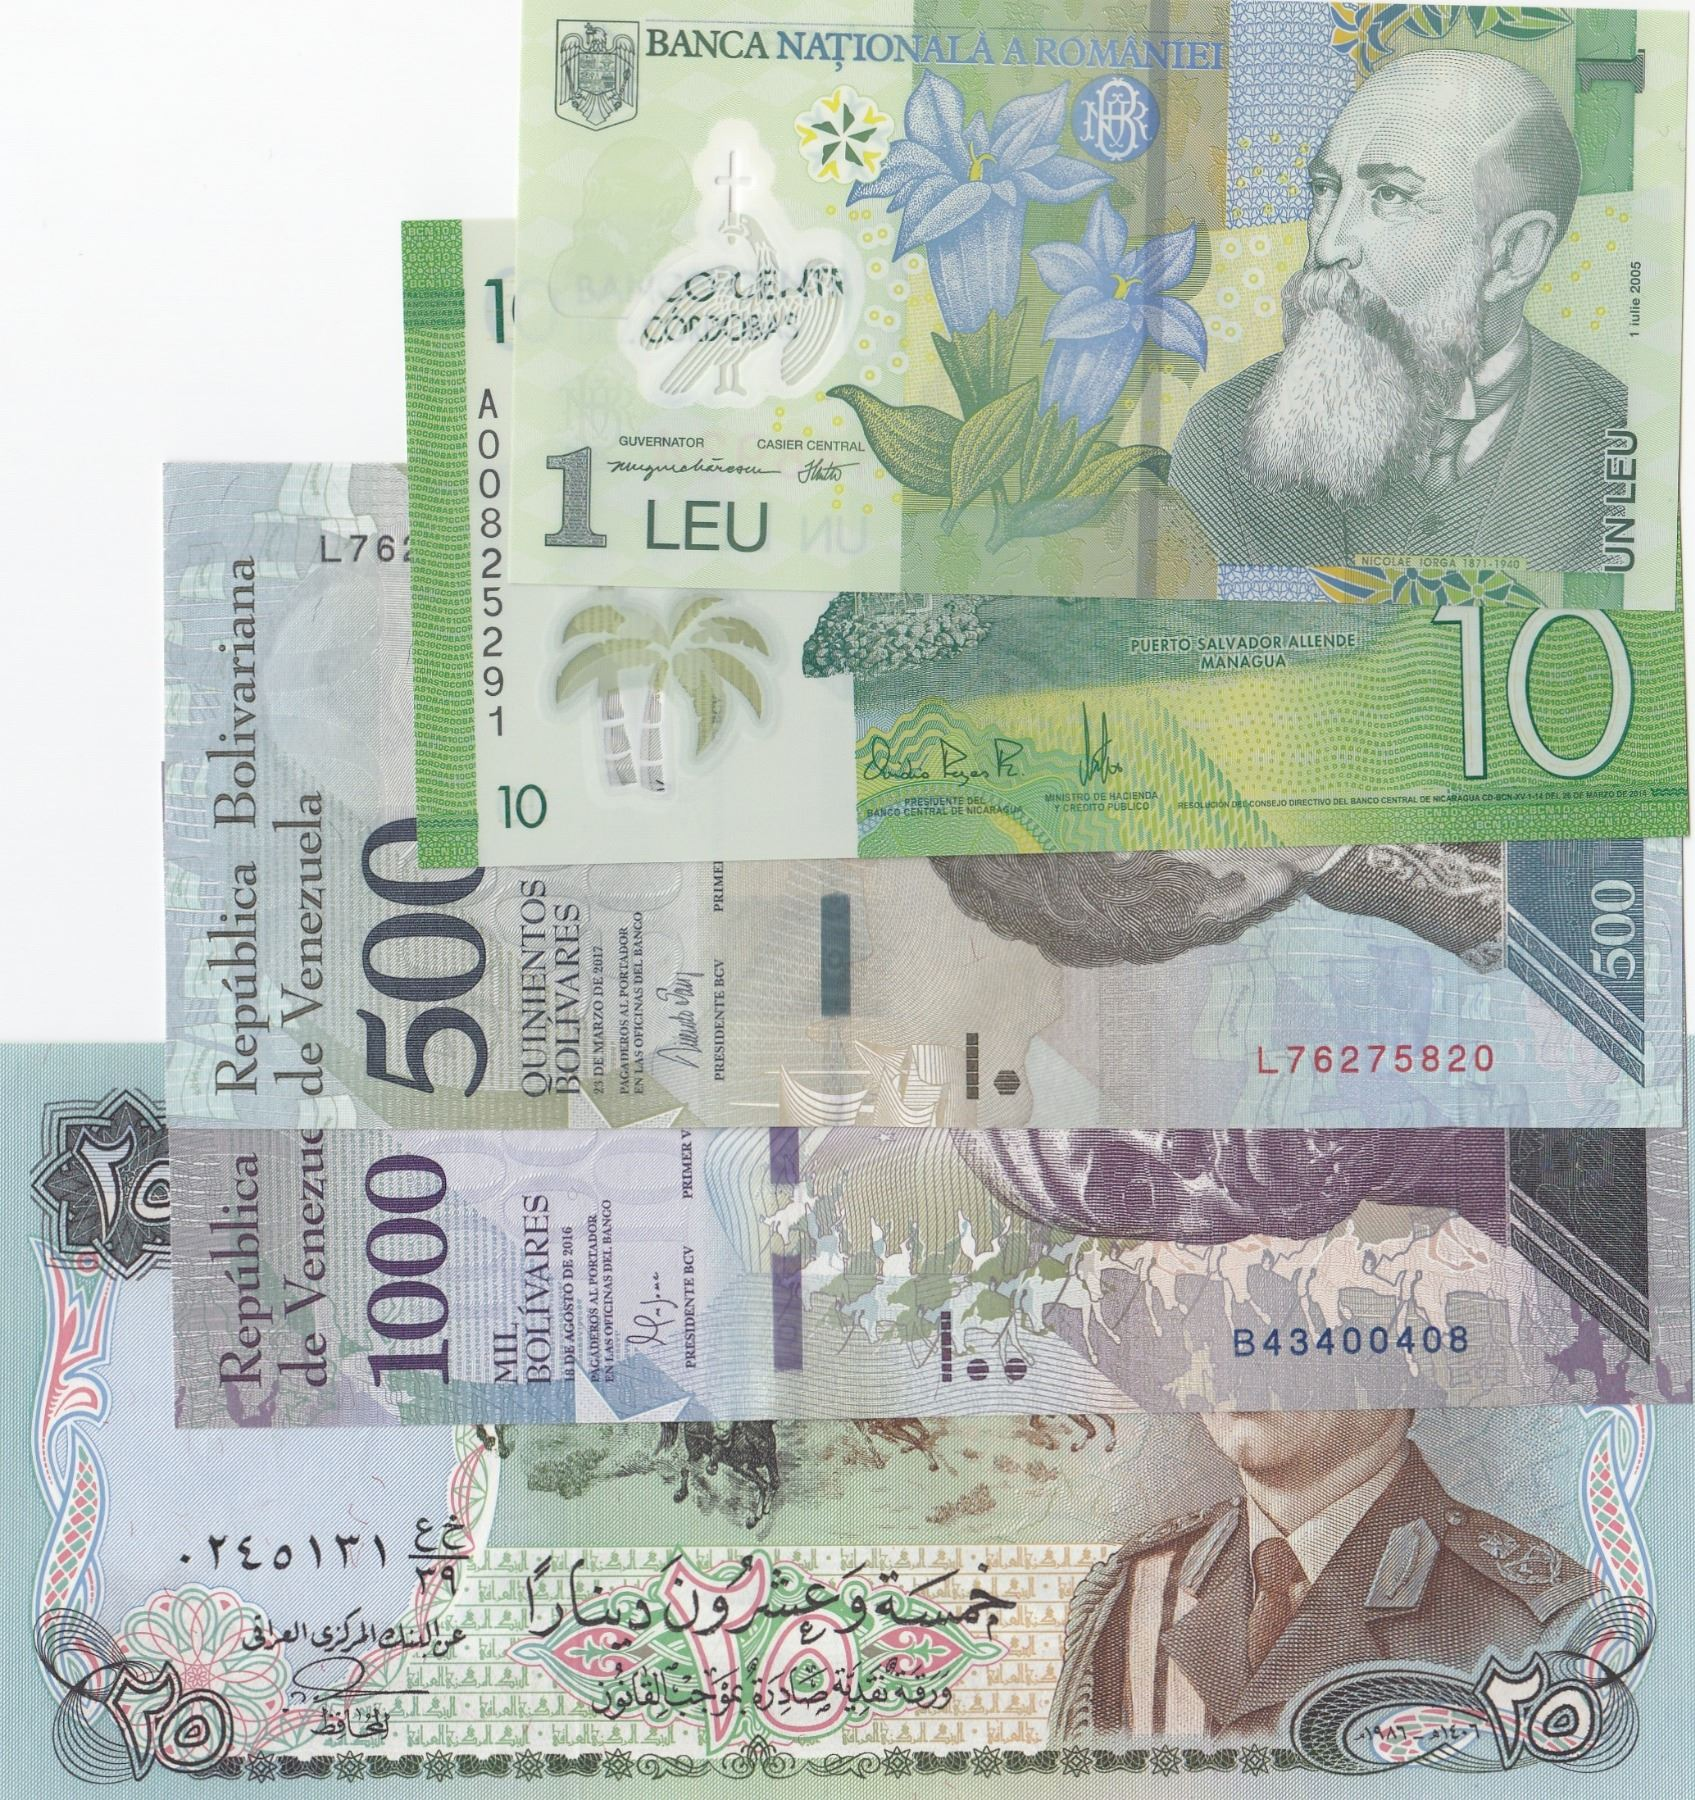 Romania 1 LEU 2005 banknote